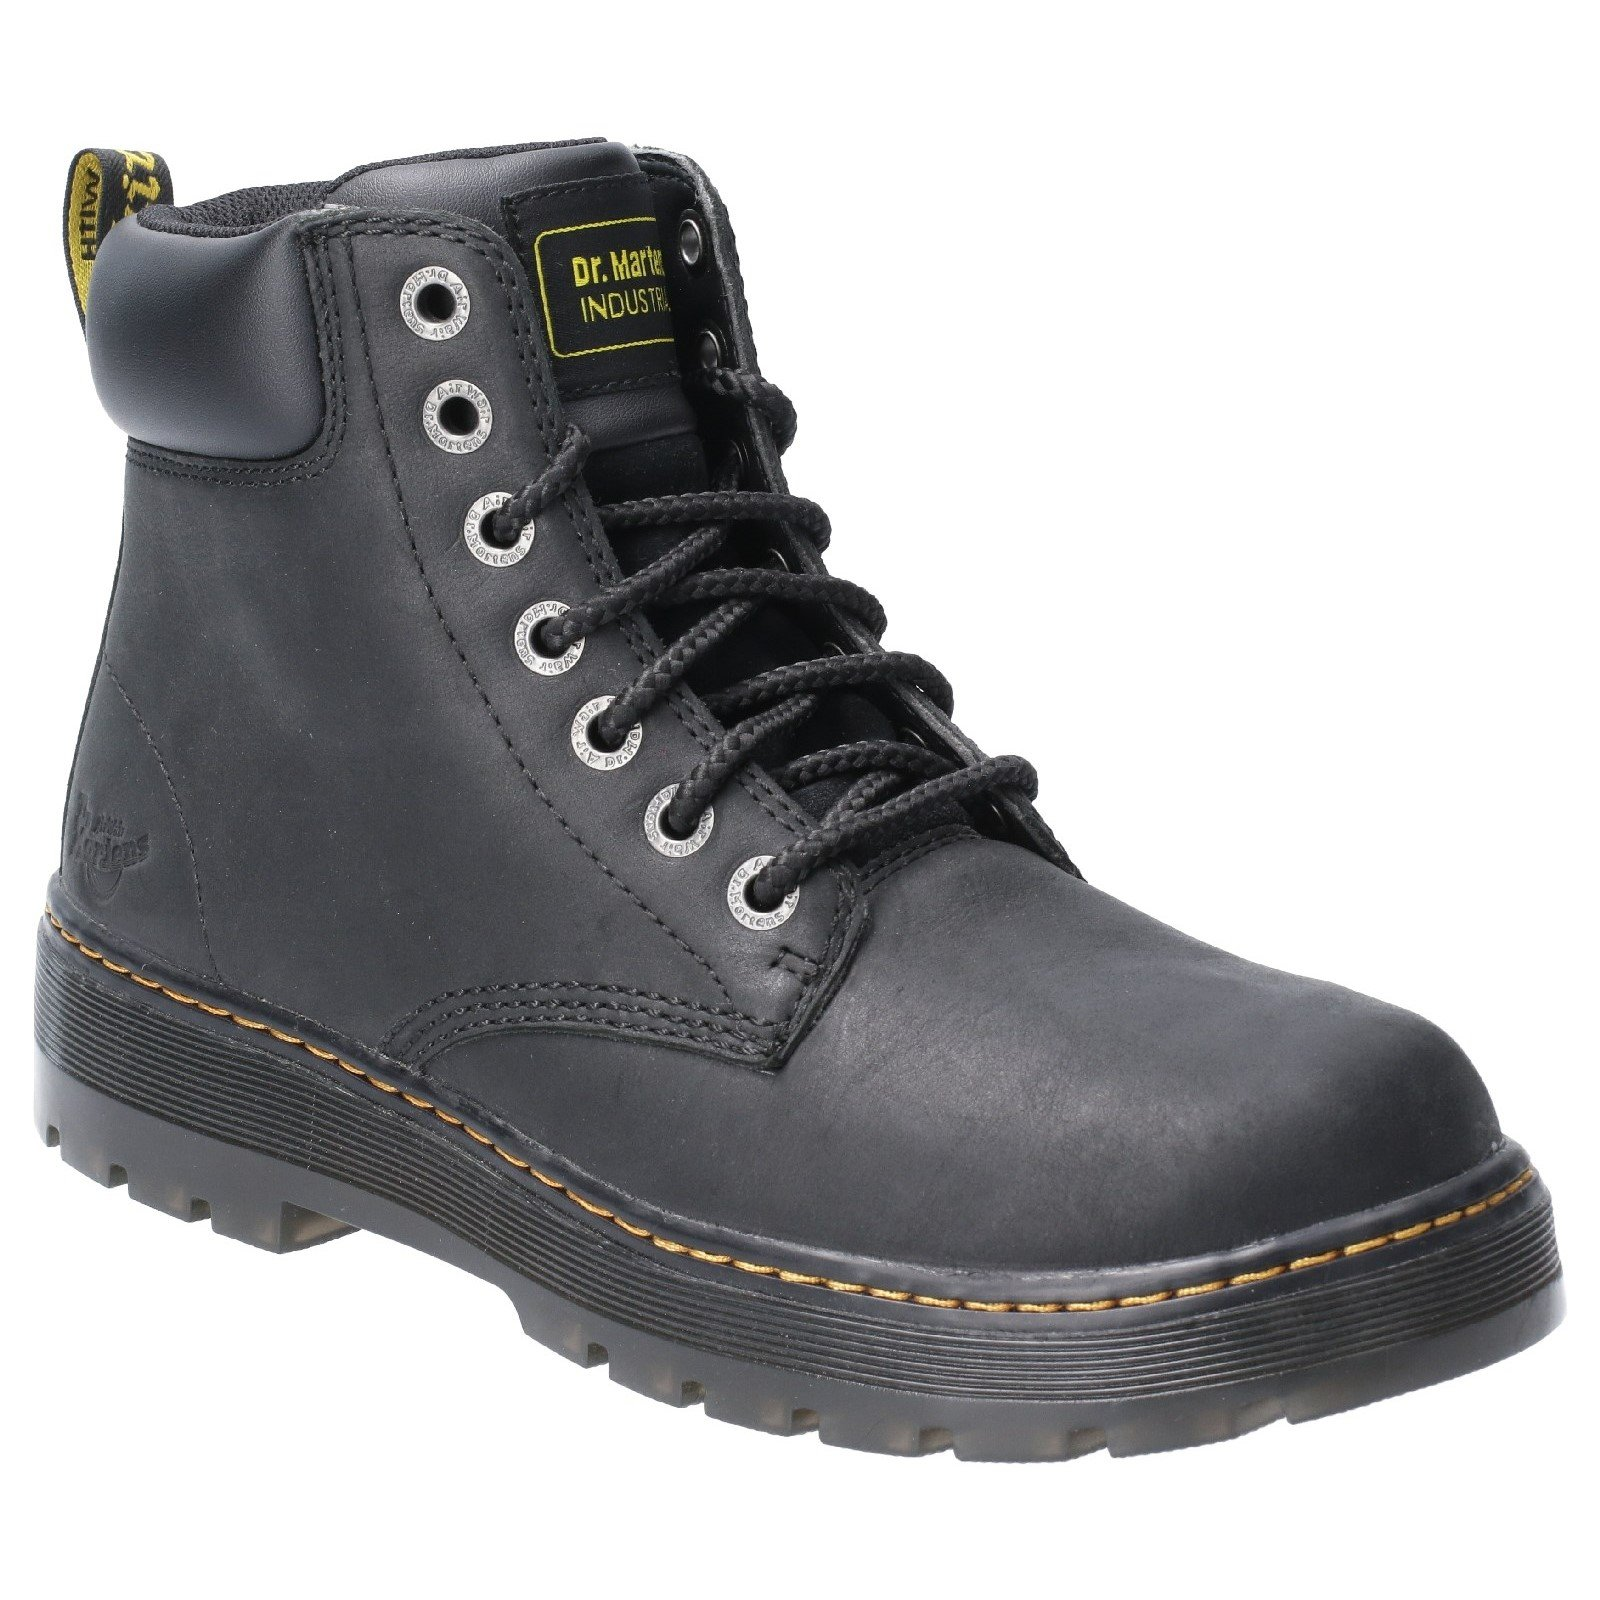 Dr Martens Men's Winch Non-Safety Work Boot Black 29821 - Black 8